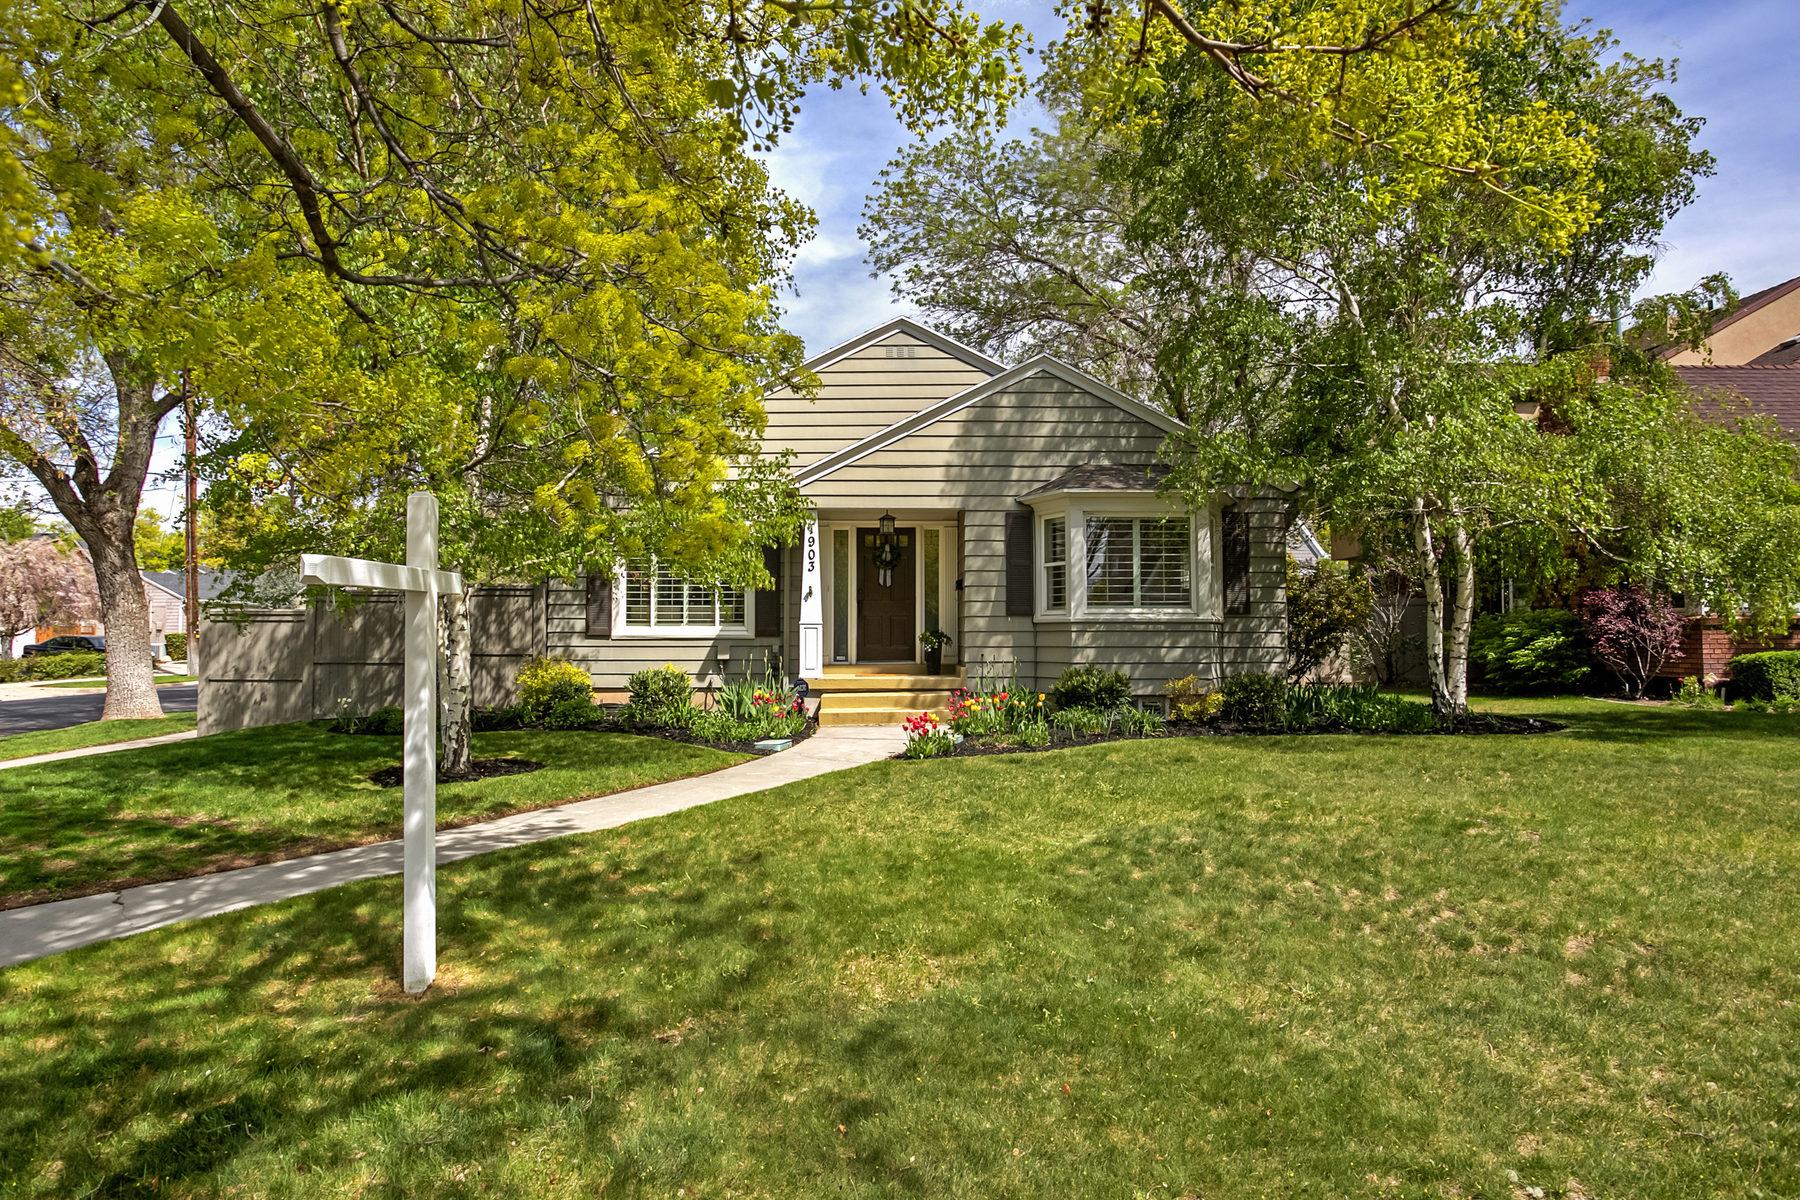 Частный односемейный дом для того Продажа на Harvard/Yale Charmer 1903 E Herbert Ave Salt Lake City, Юта, 84108 Соединенные Штаты